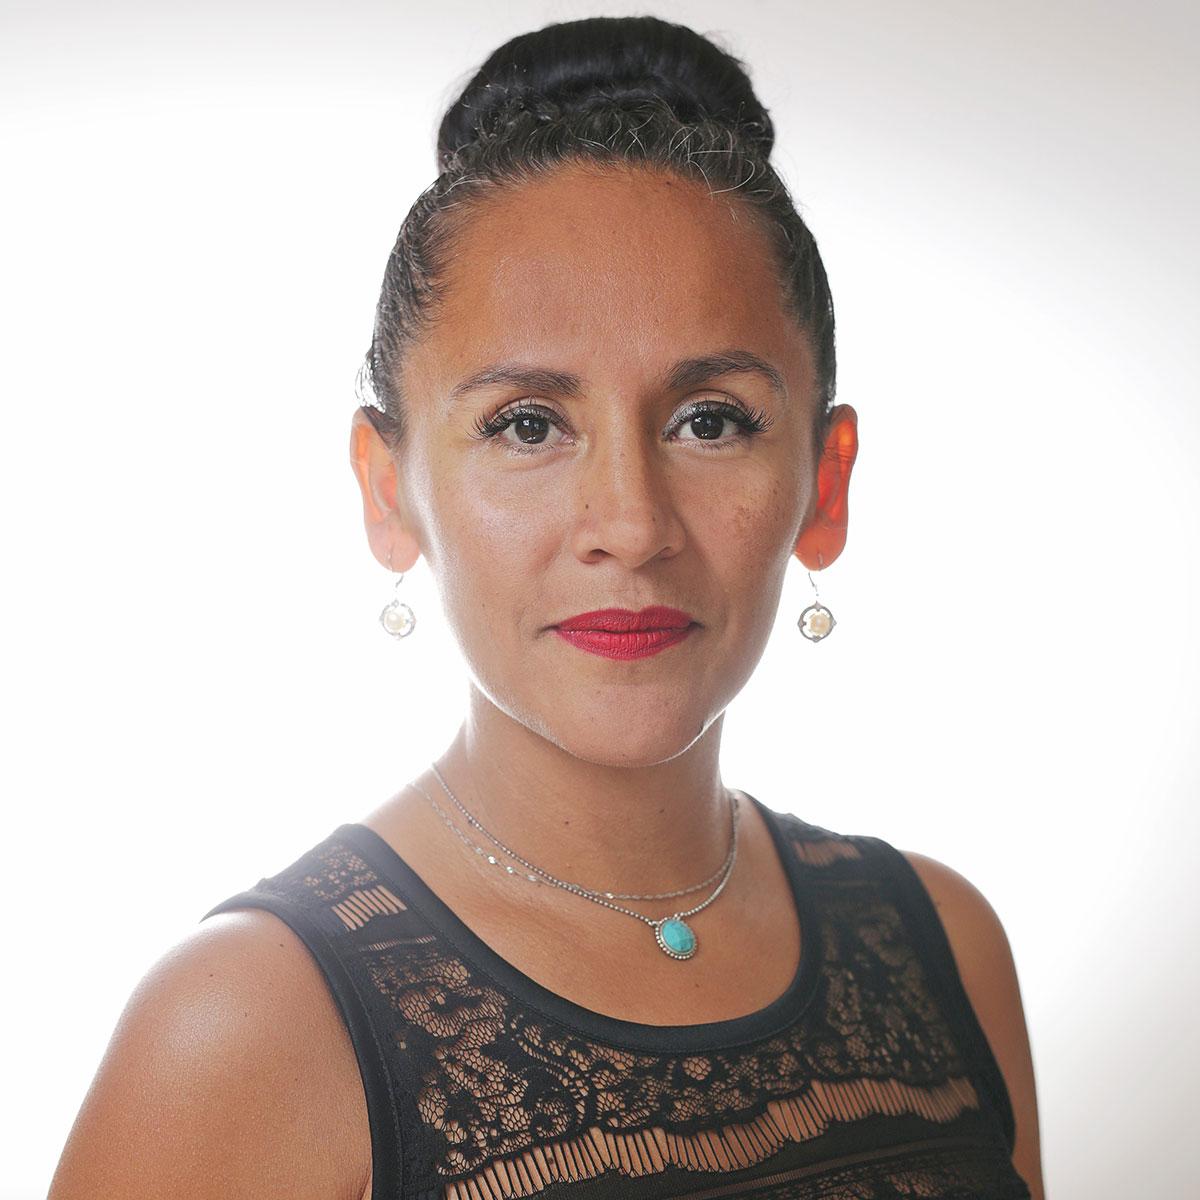 Portrait de Cynthia Soto Cancino